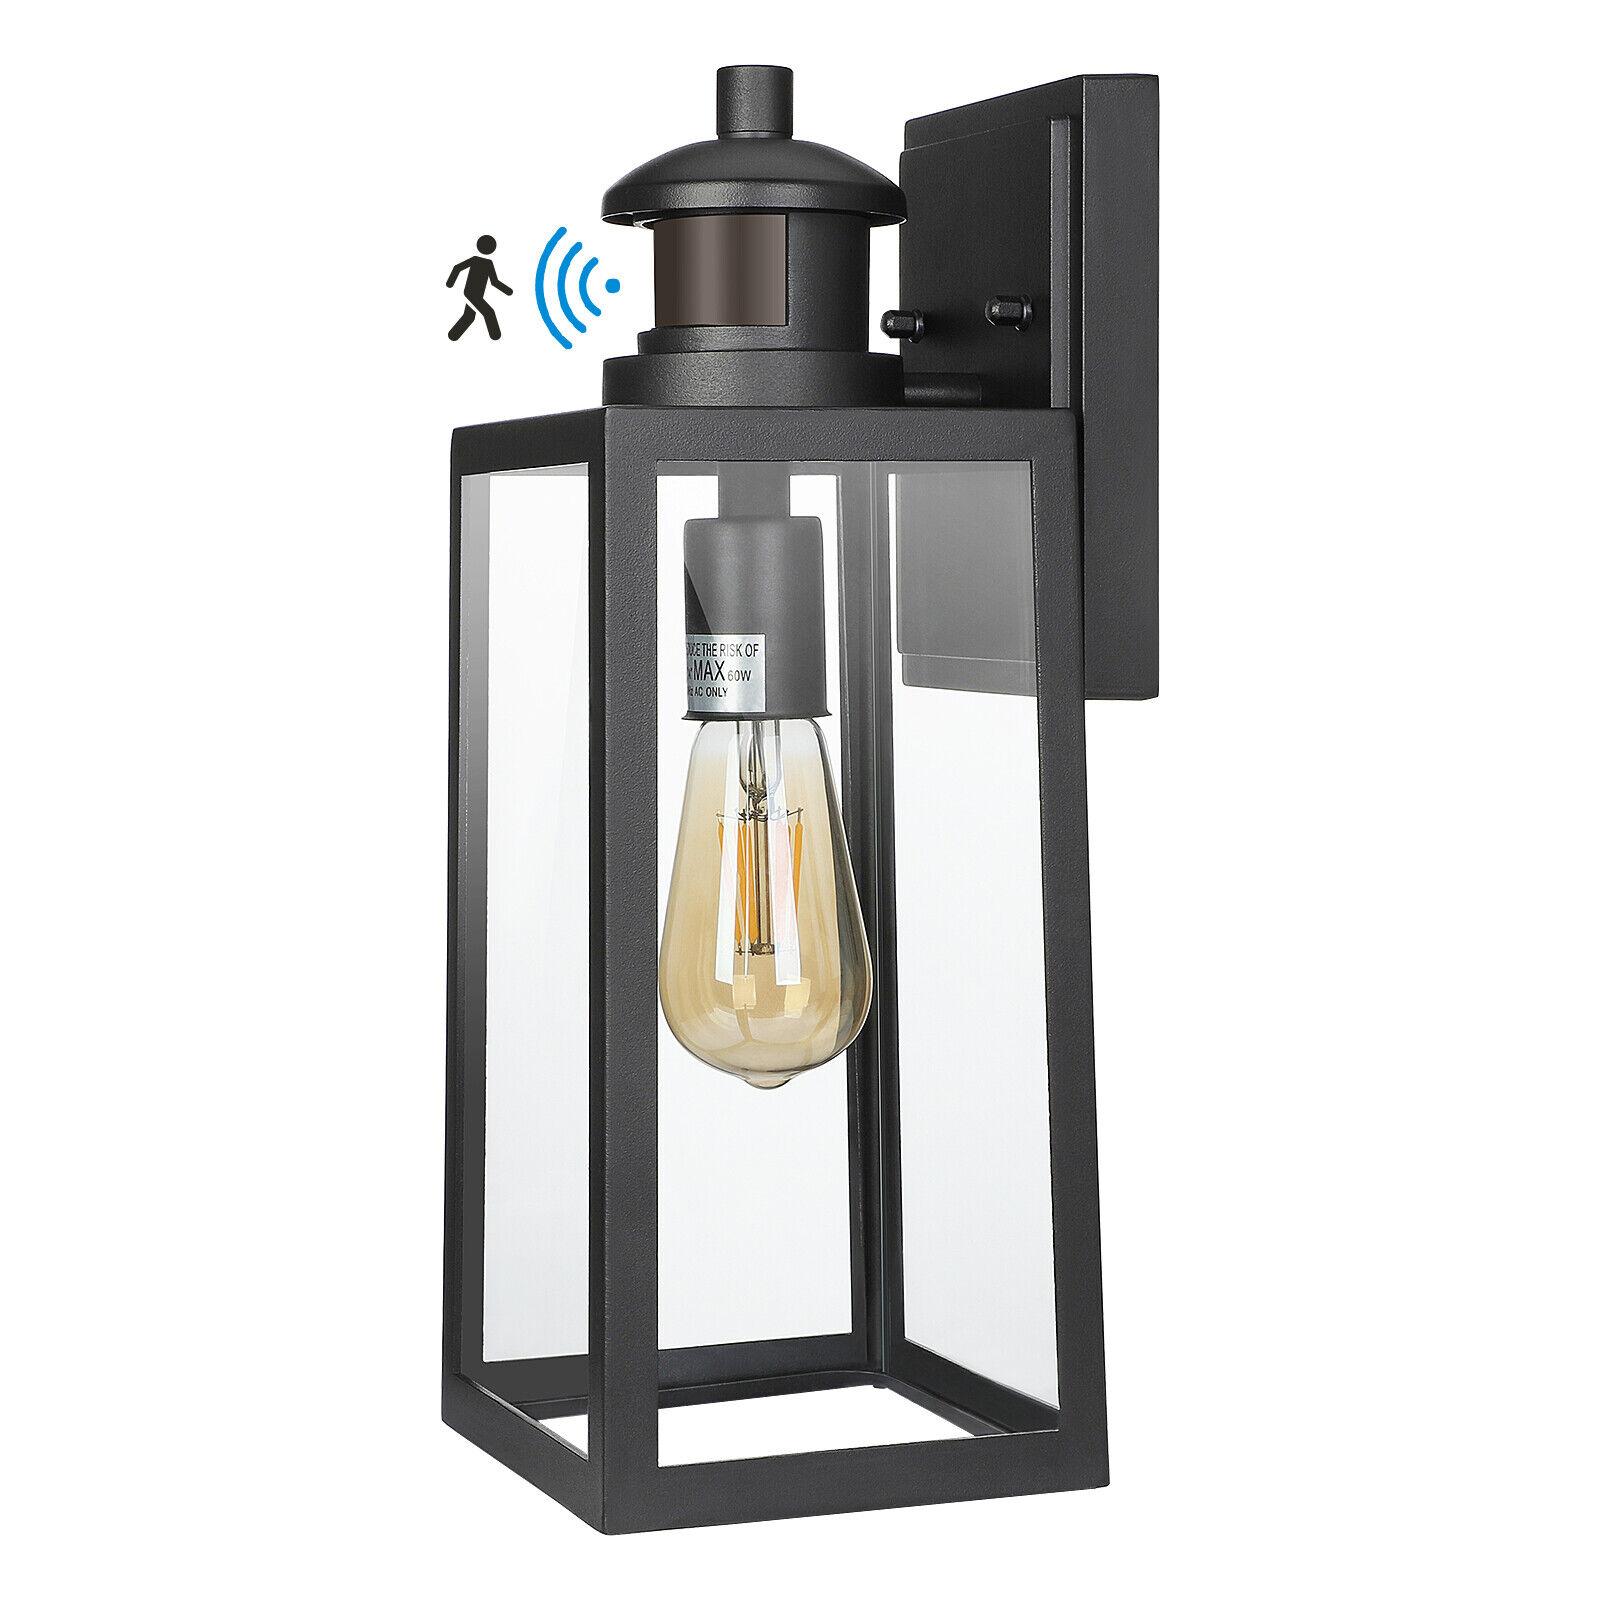 DEWENWILS Outdoor Wall Light Fixture Motion Sensor Wall Sconce Light Porch Lamp